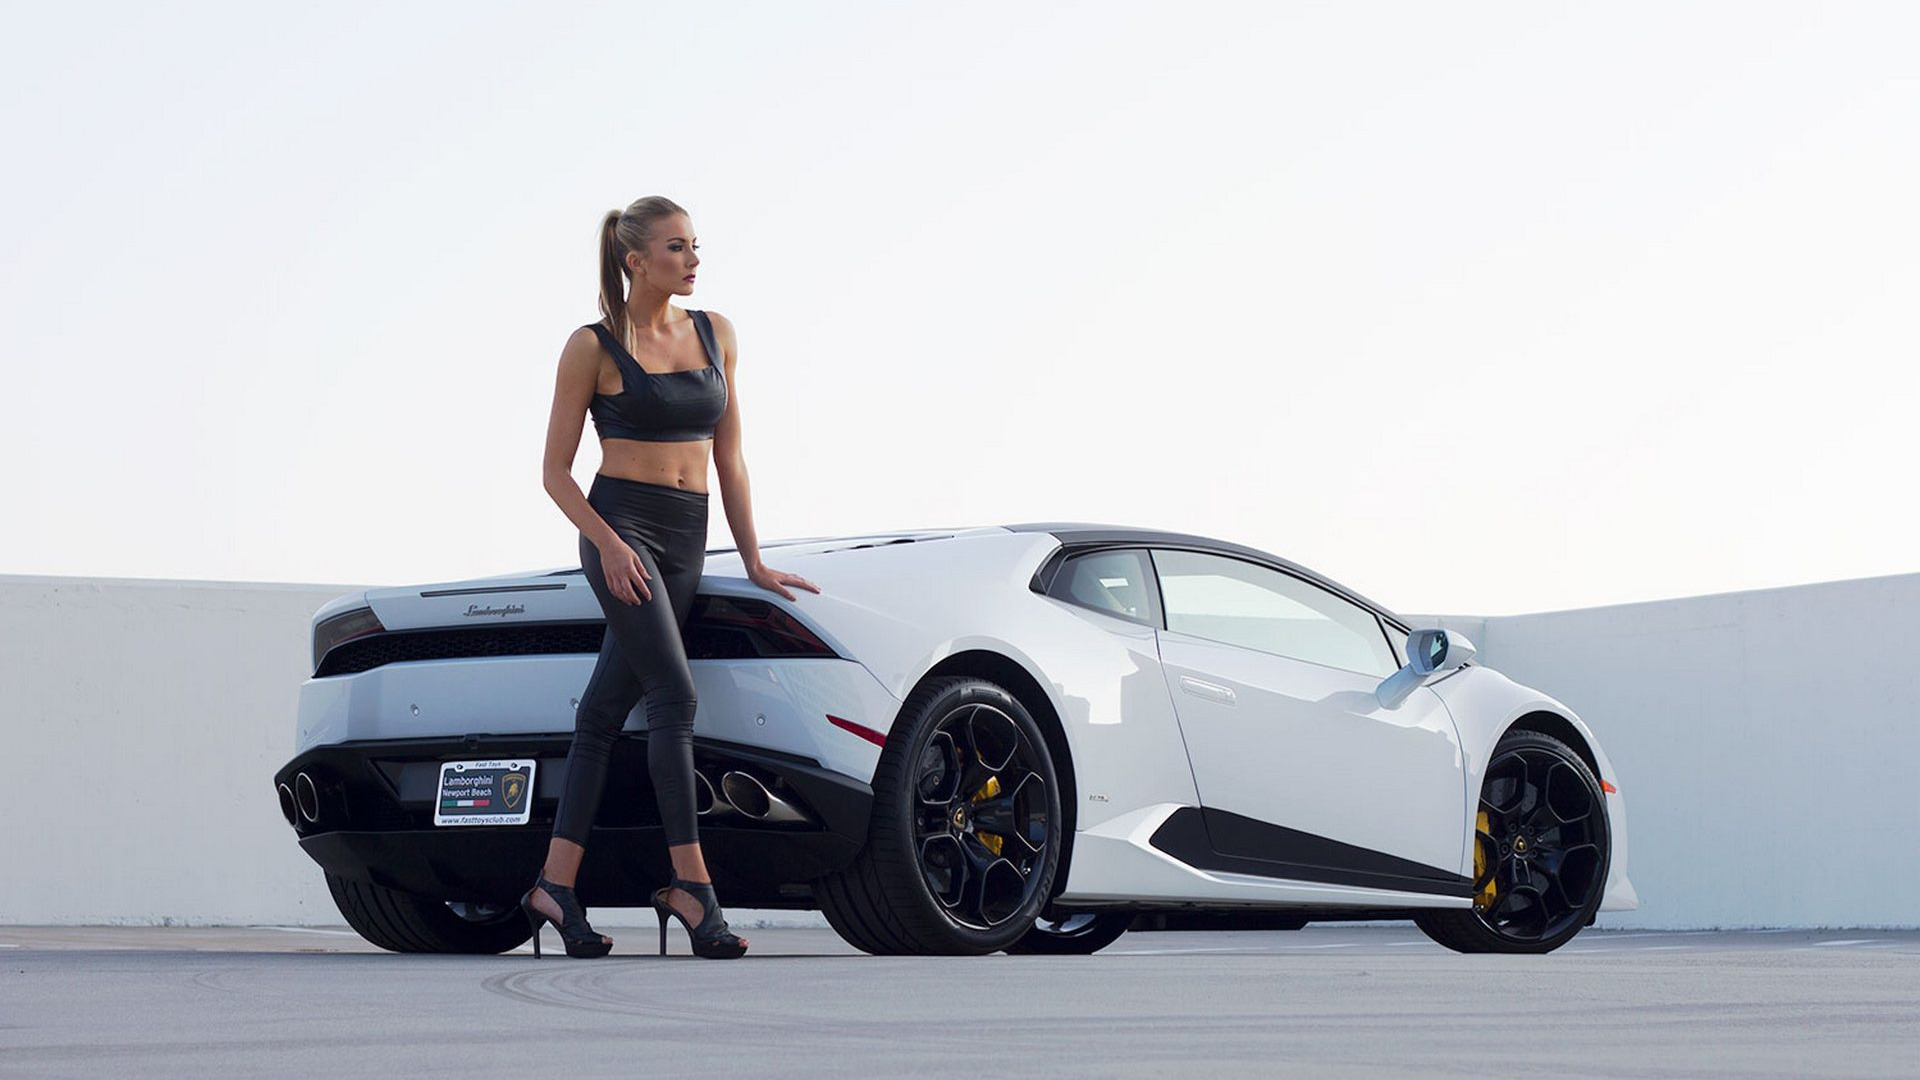 Download Wallpaper Girl Girls Lamborghini Hairstyle Blonde Heels White Car Section Girls In Resolution 1920x1080